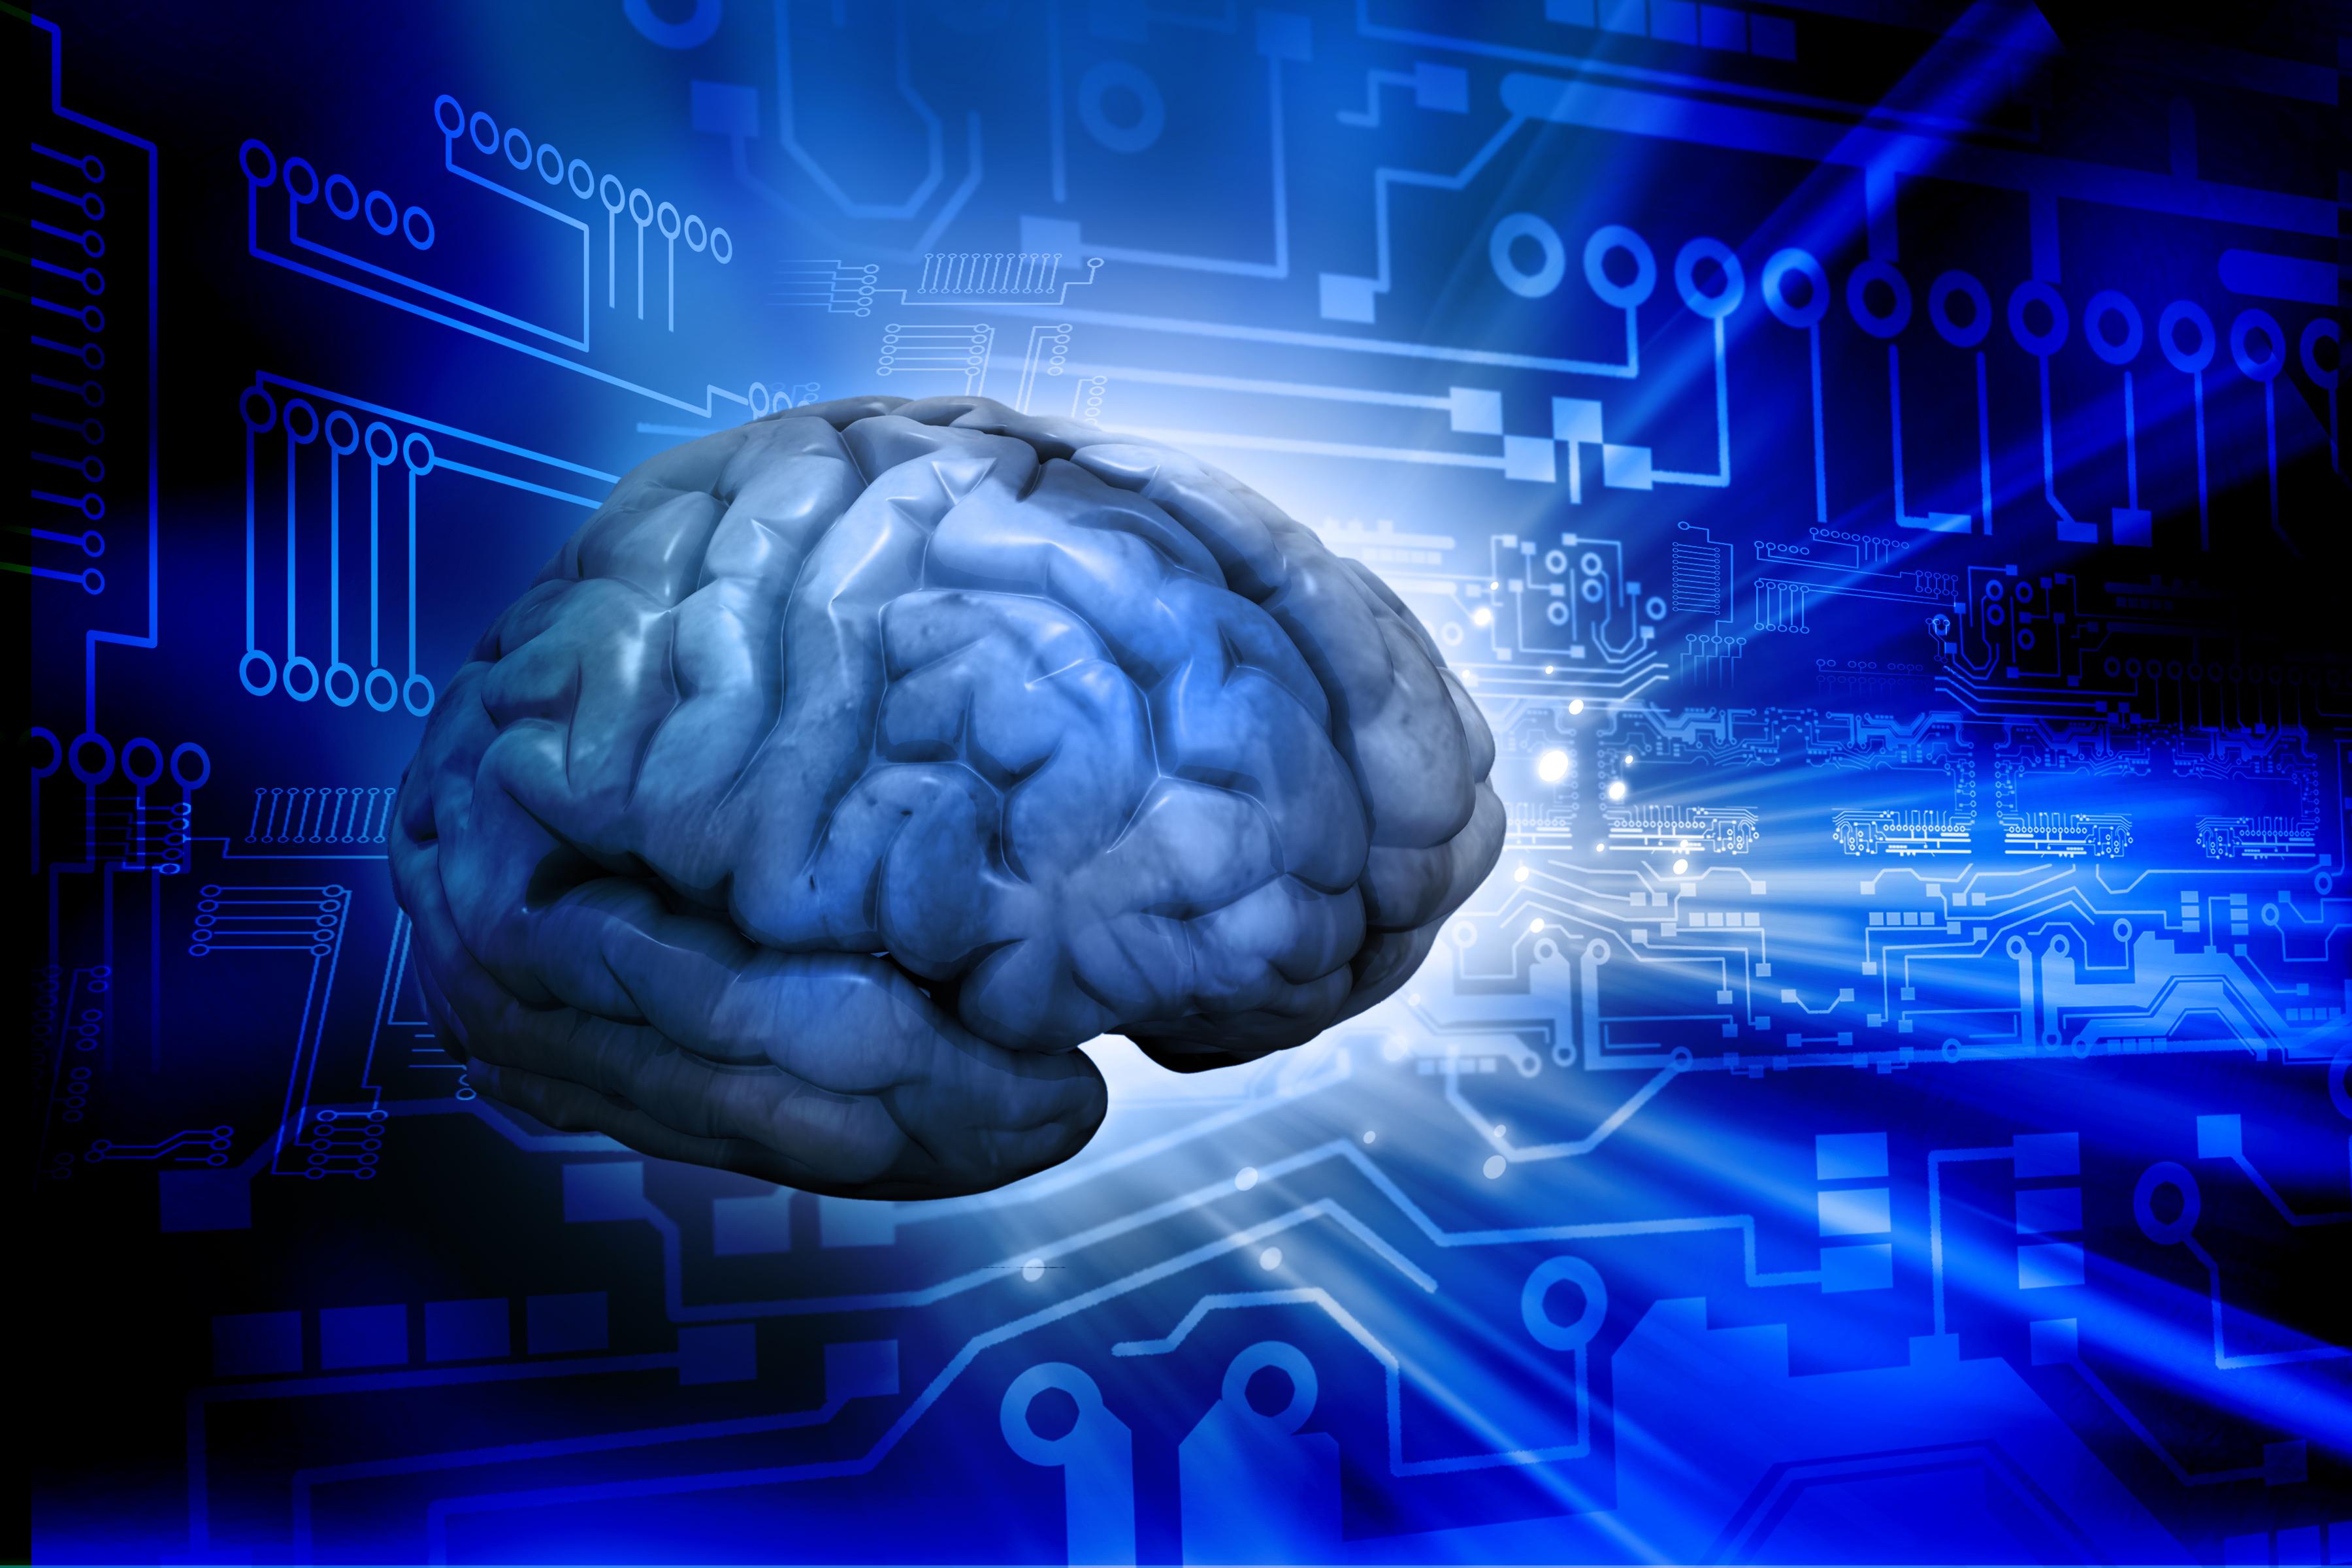 Cyber brain - generic